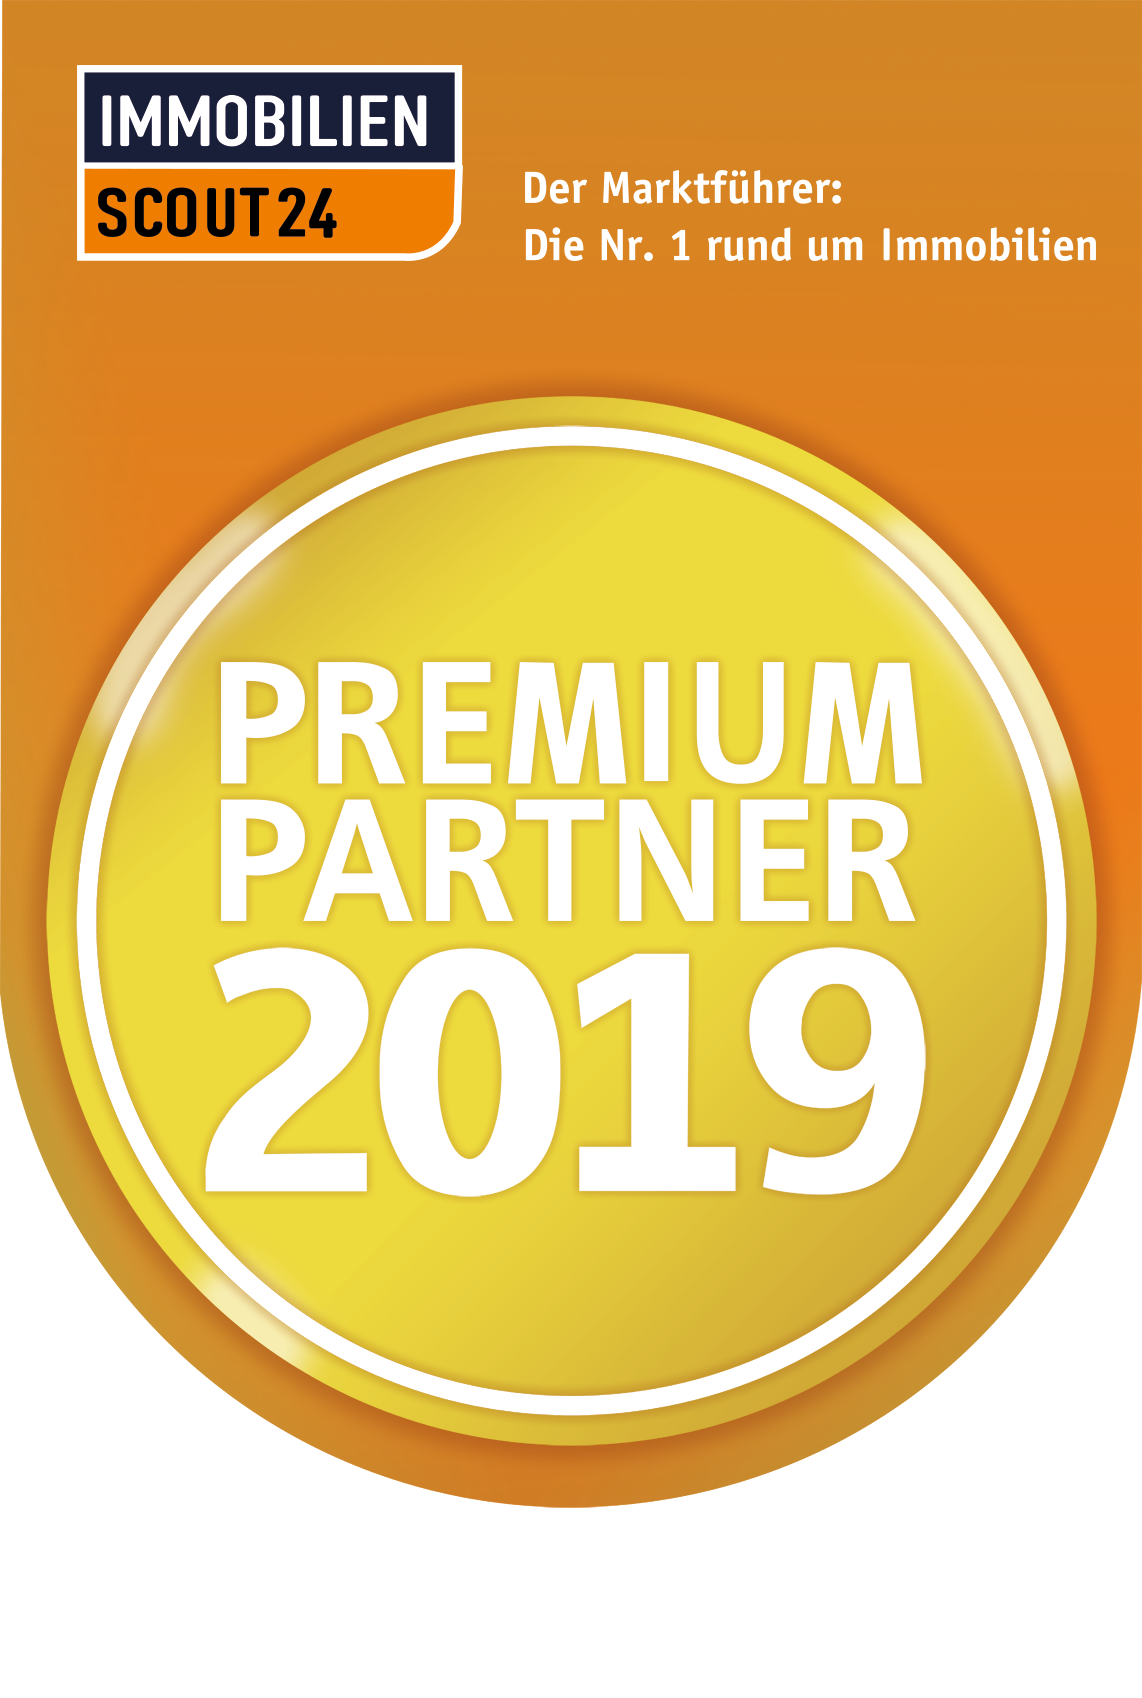 ImmobilienScout24 Premium Partner 2019